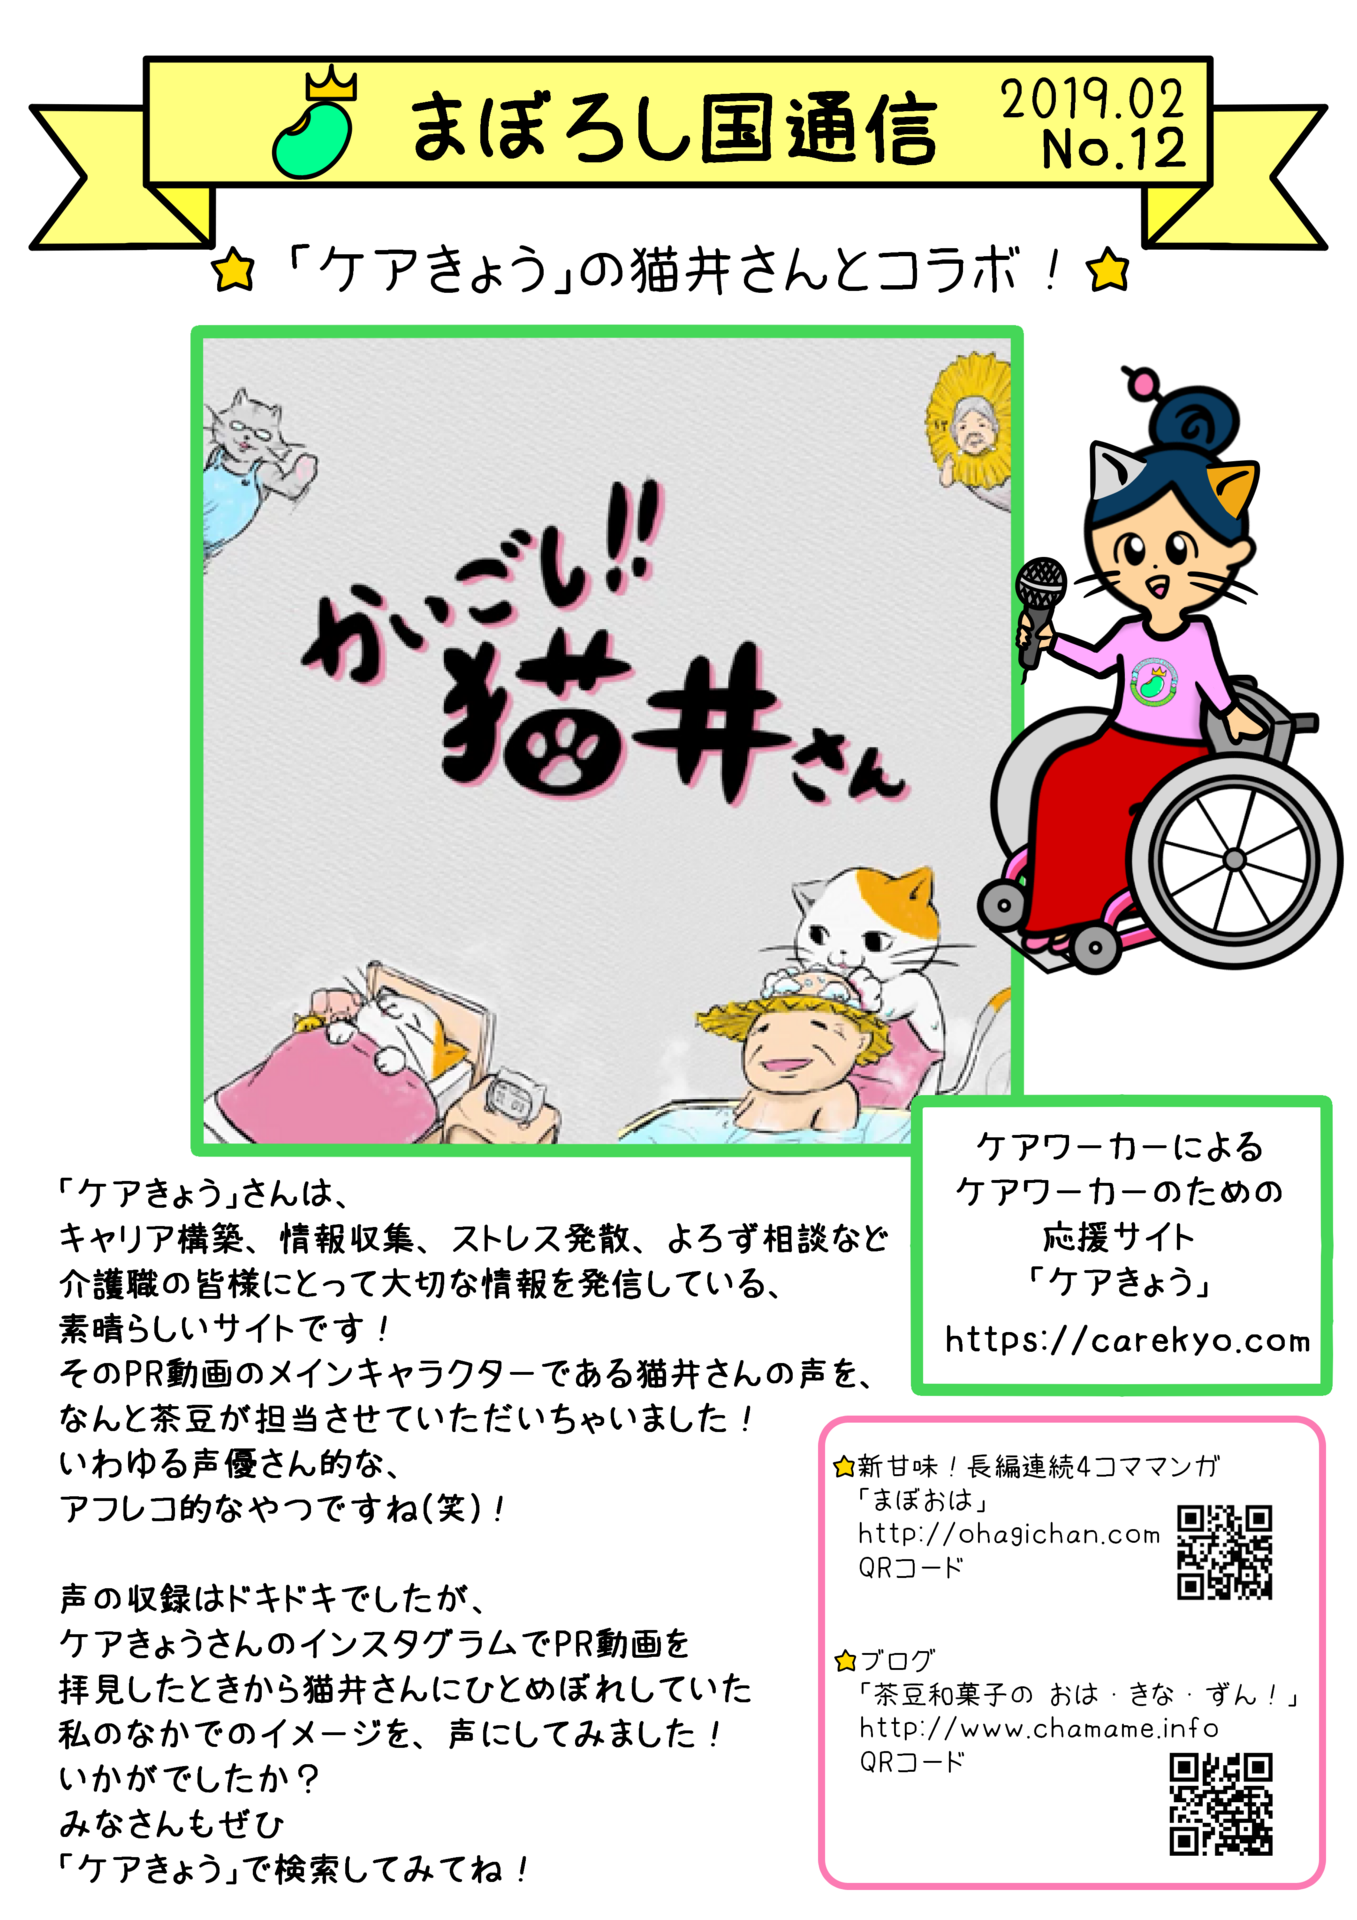 No.12_20190207猫井さん.png